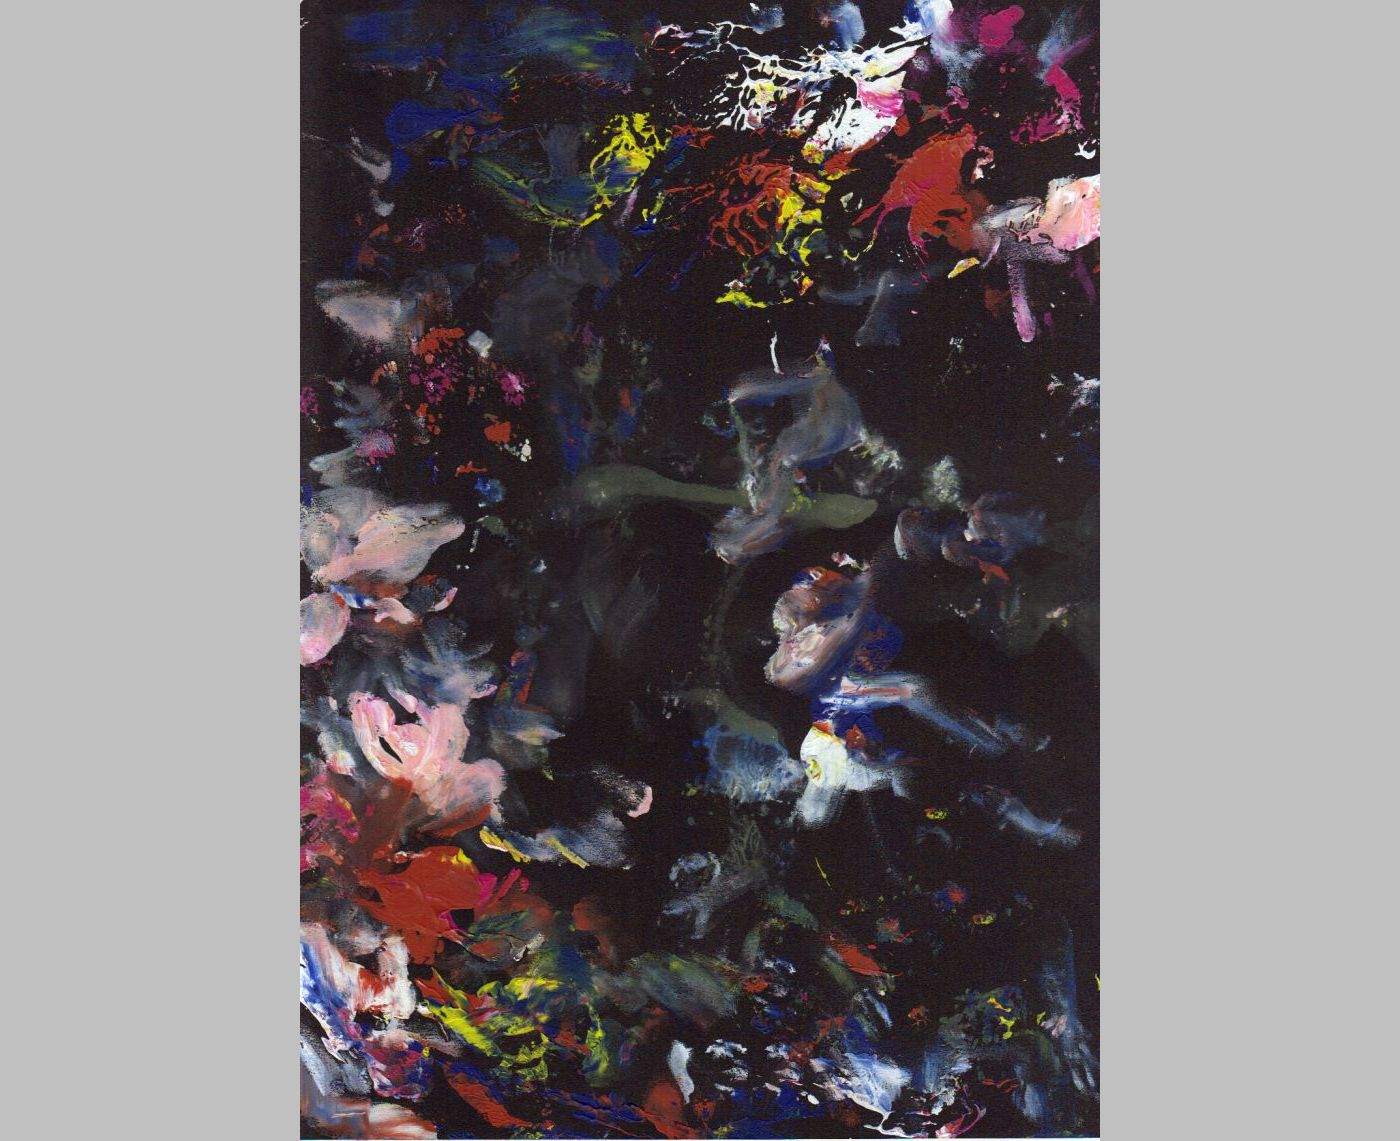 Deepsea One (1, 2013, 21 x 29,7 cm, A4)